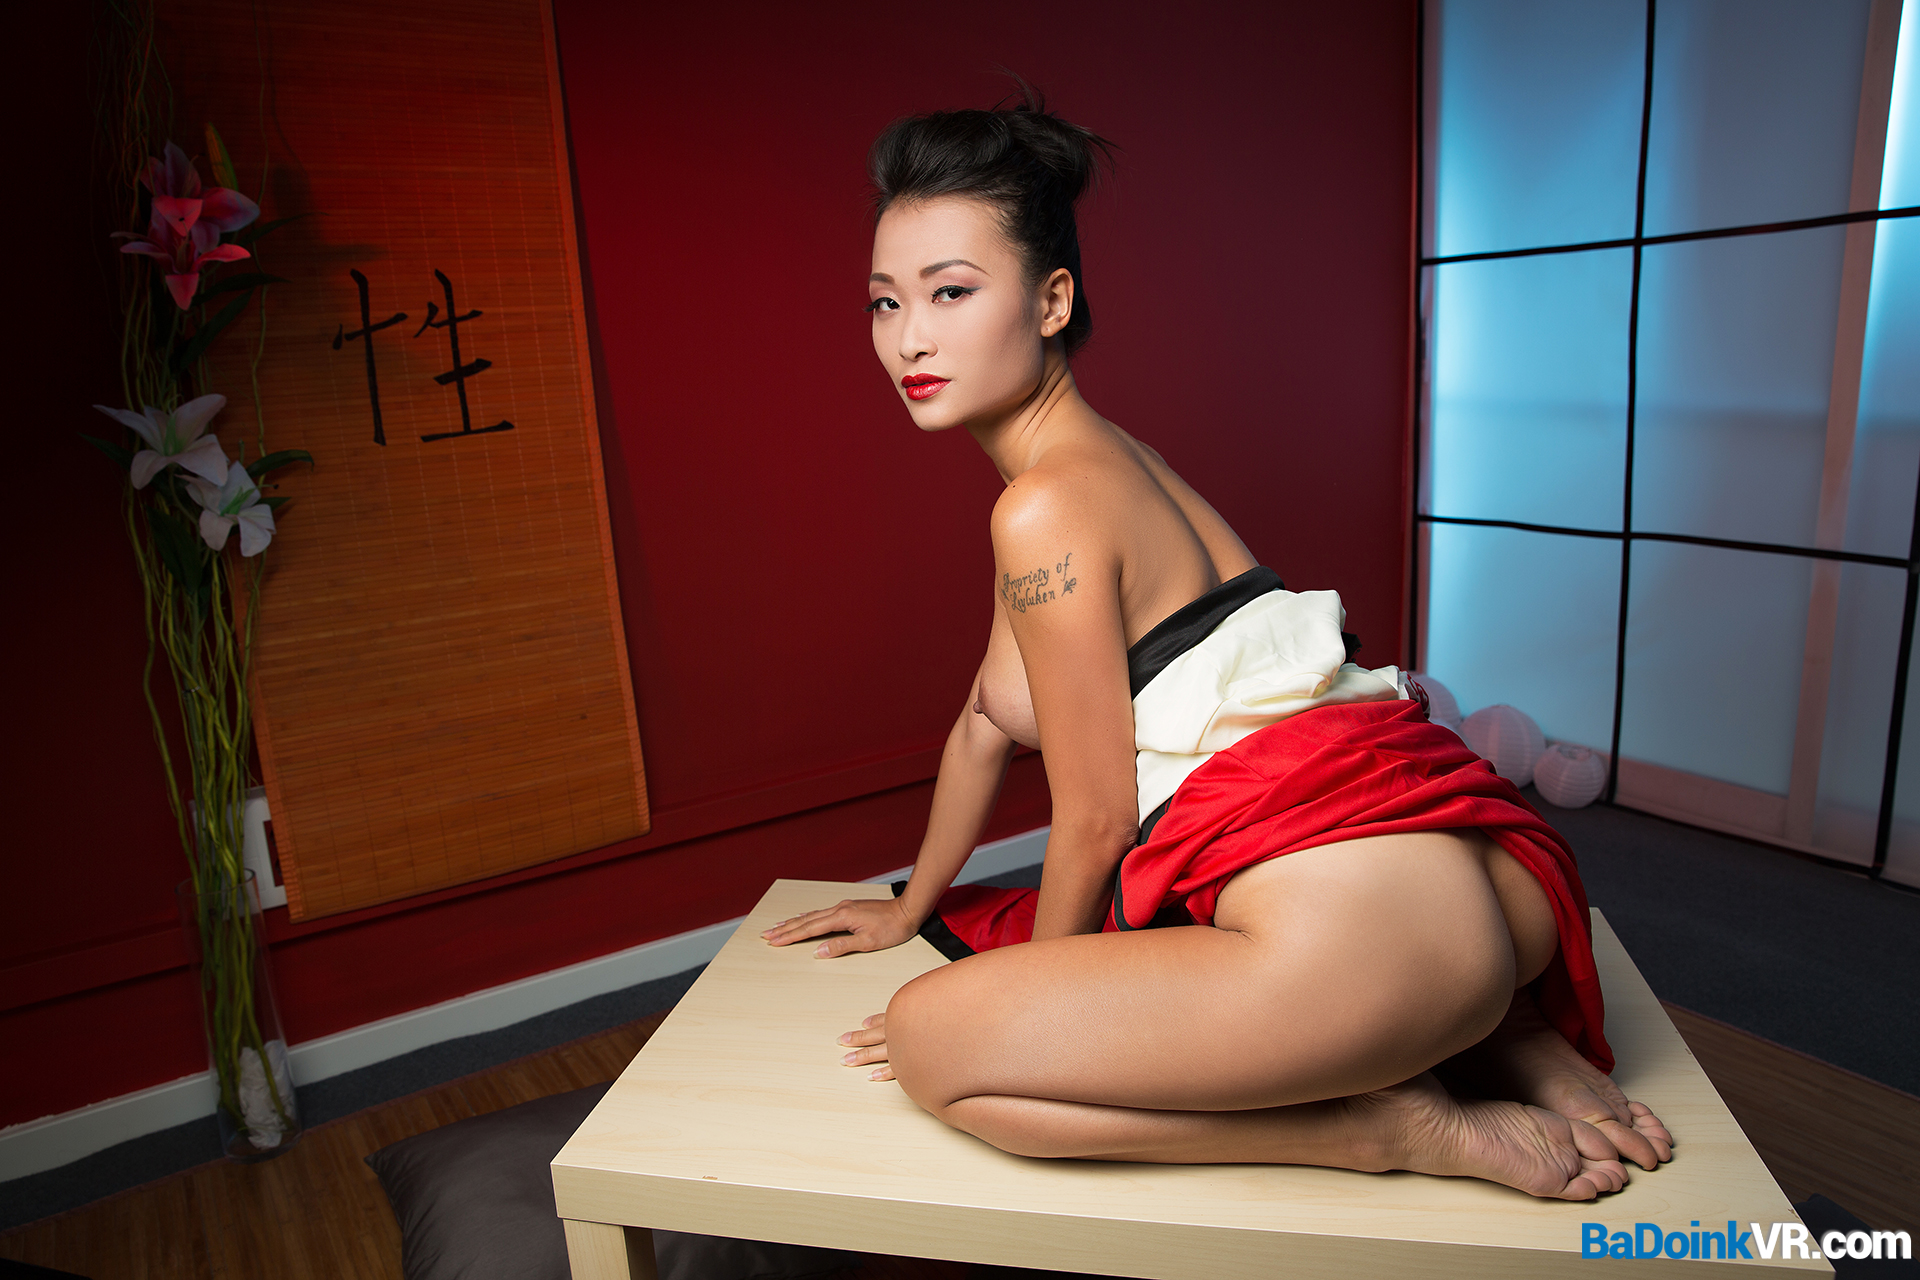 geisha-to-go-porno-anna-fowler-busty